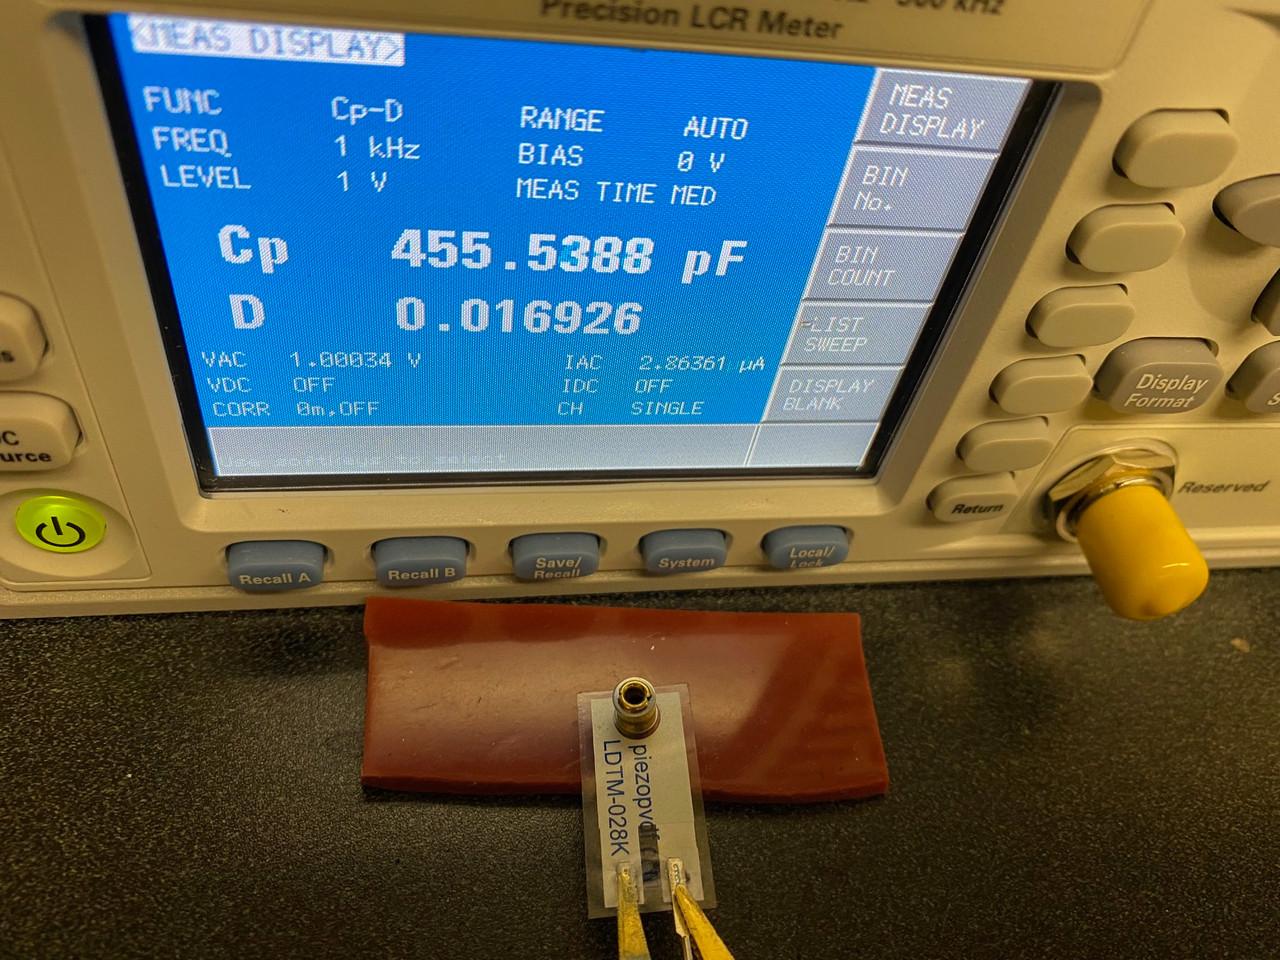 Piezoelectric PVDF Vibration Sensor With Mass